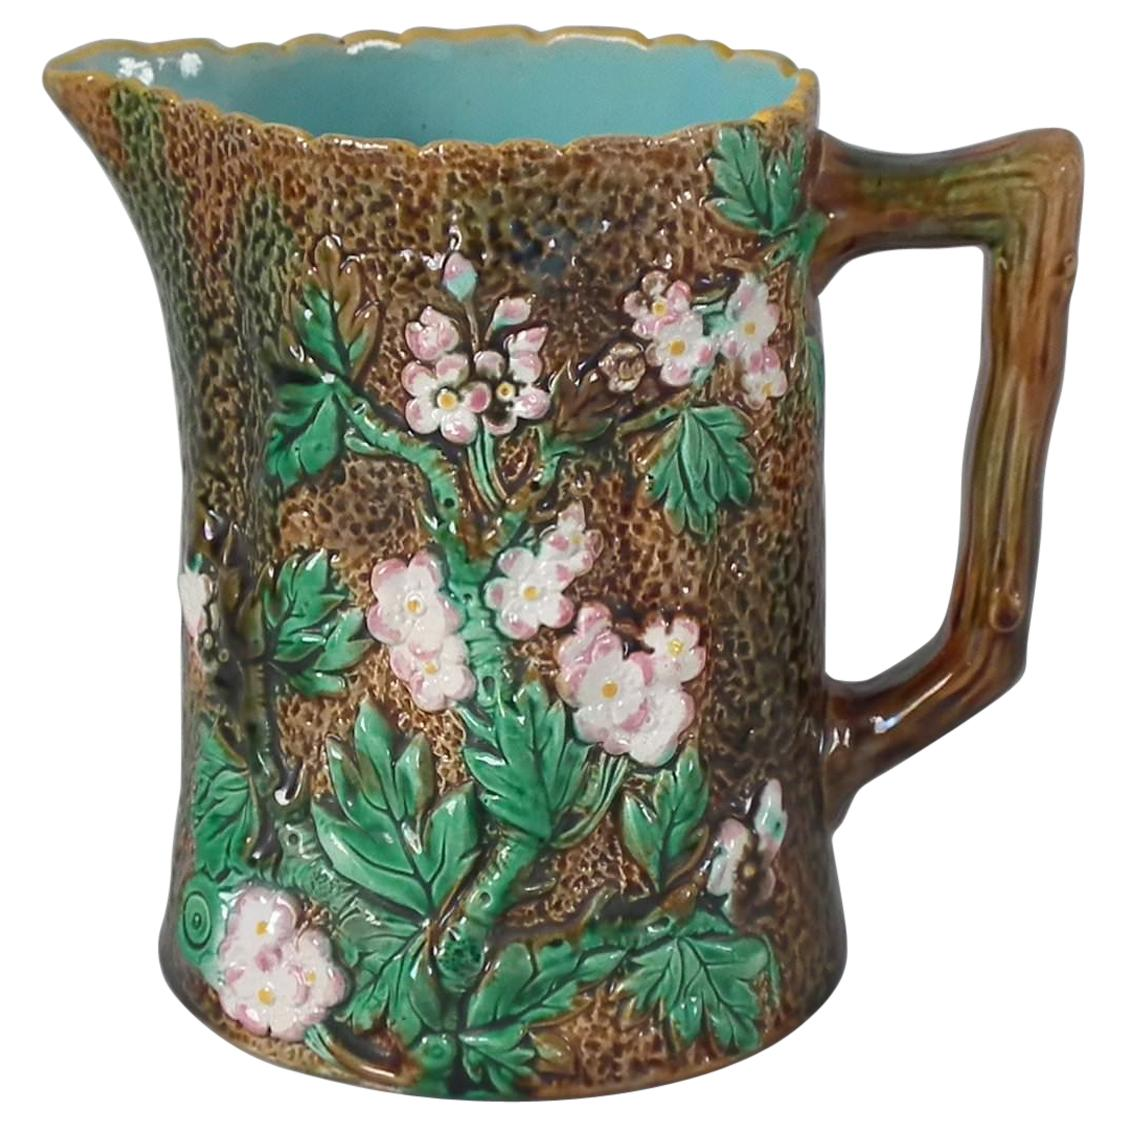 Victorian George Jones Majolica Rustic Blossom Pitcher